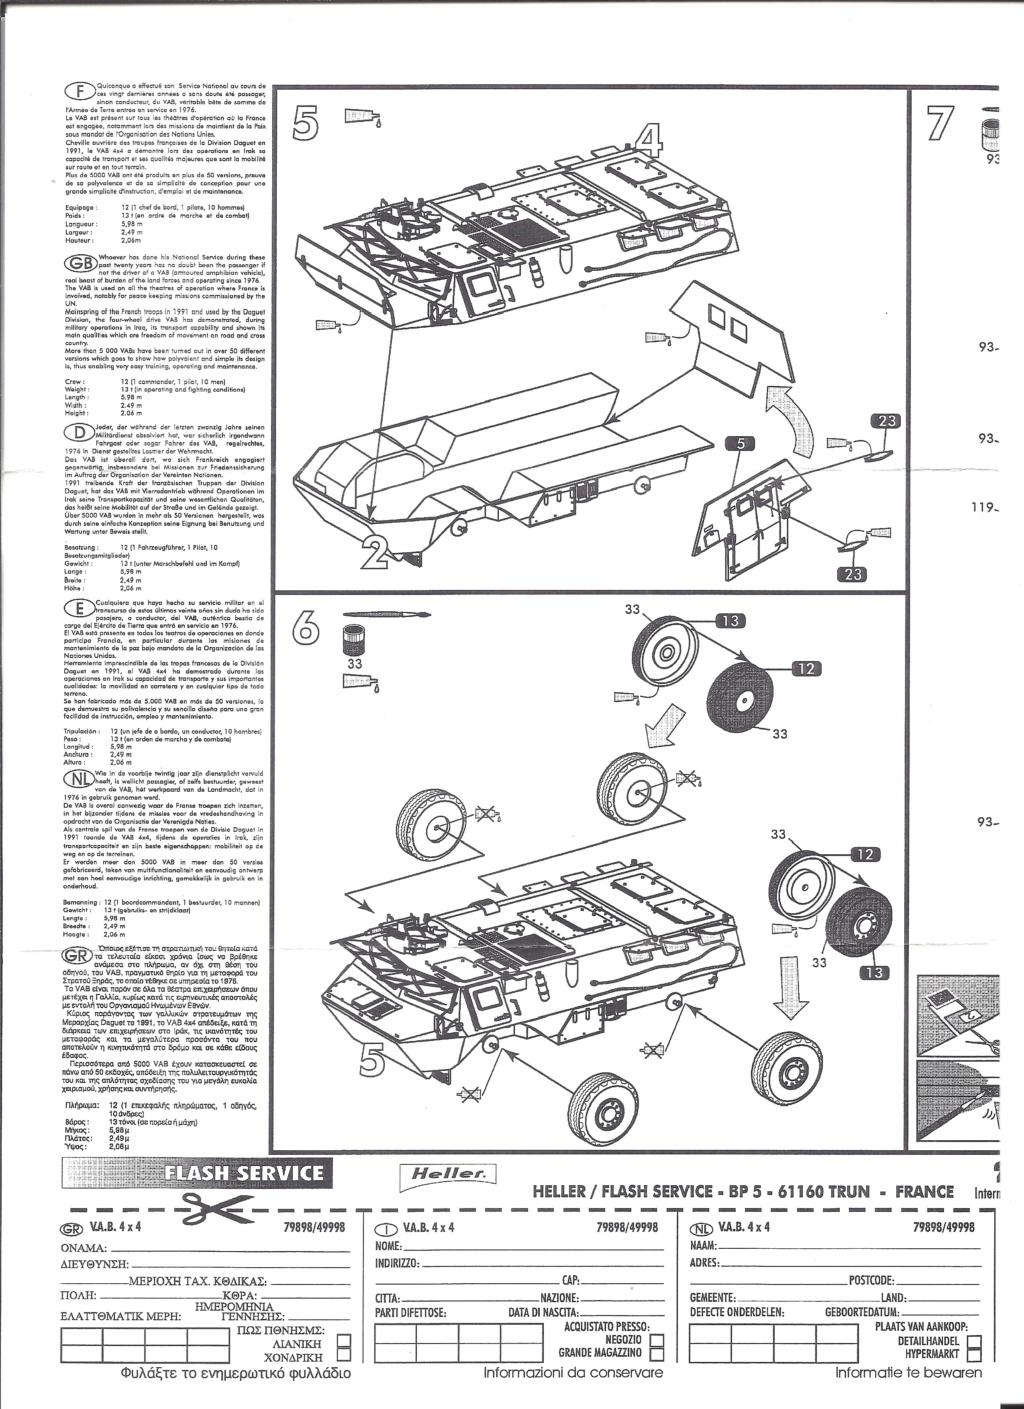 RENAULT VAB 4X4 1/72ème Ref 79898 Notice Helle384